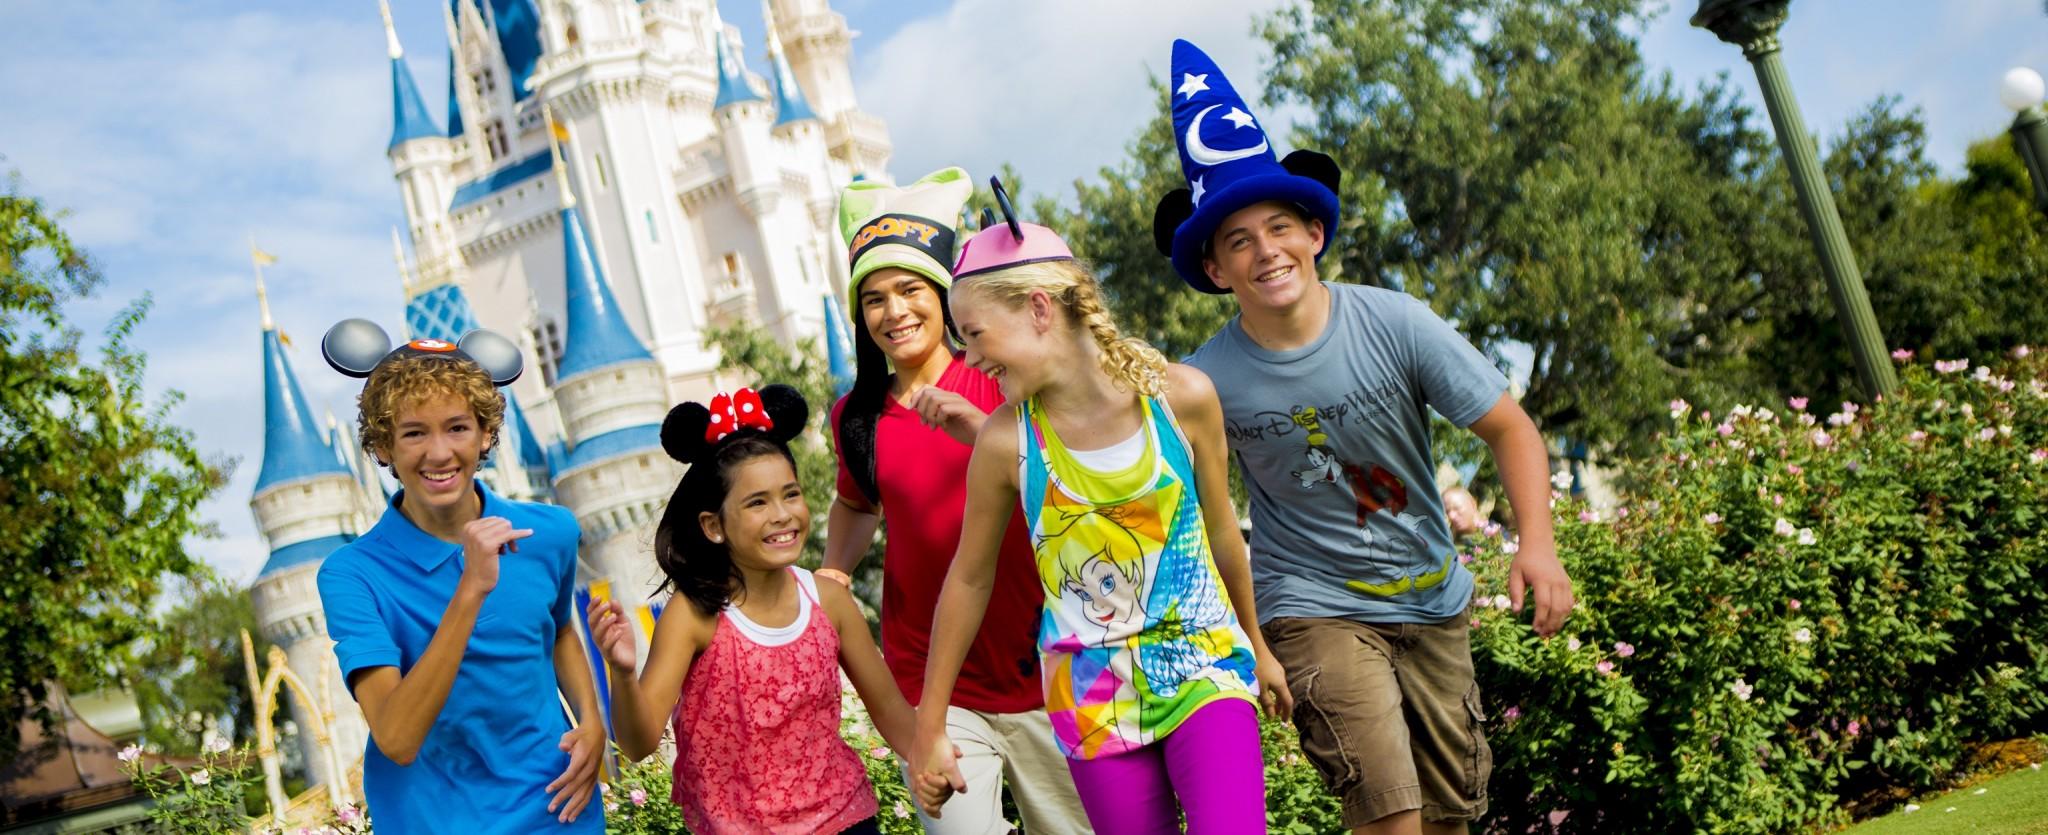 Family Fun at Walt Disney World